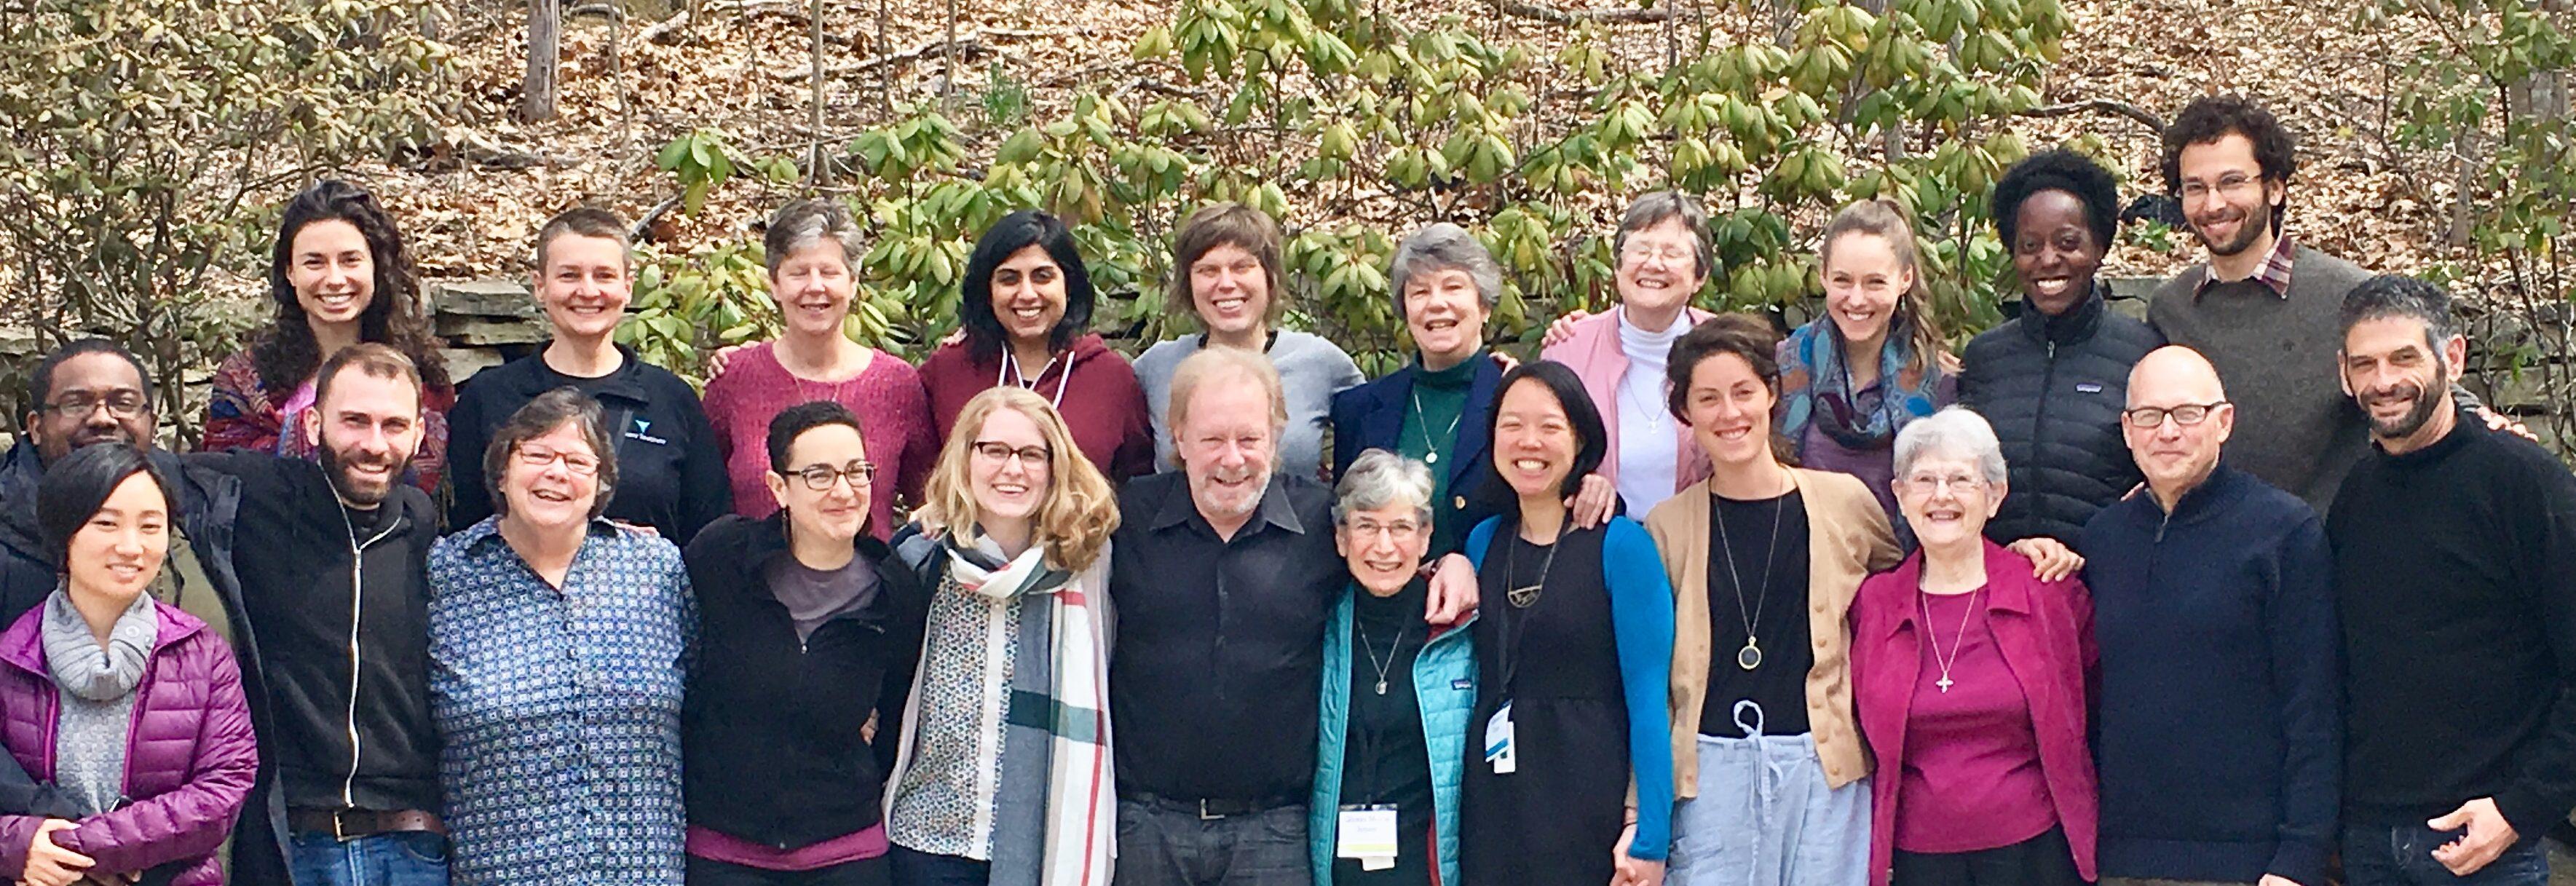 Nuns & Nones gathering in April 2018 Fetzer Center, Kalamazoo Michigan Millennials and Sisters